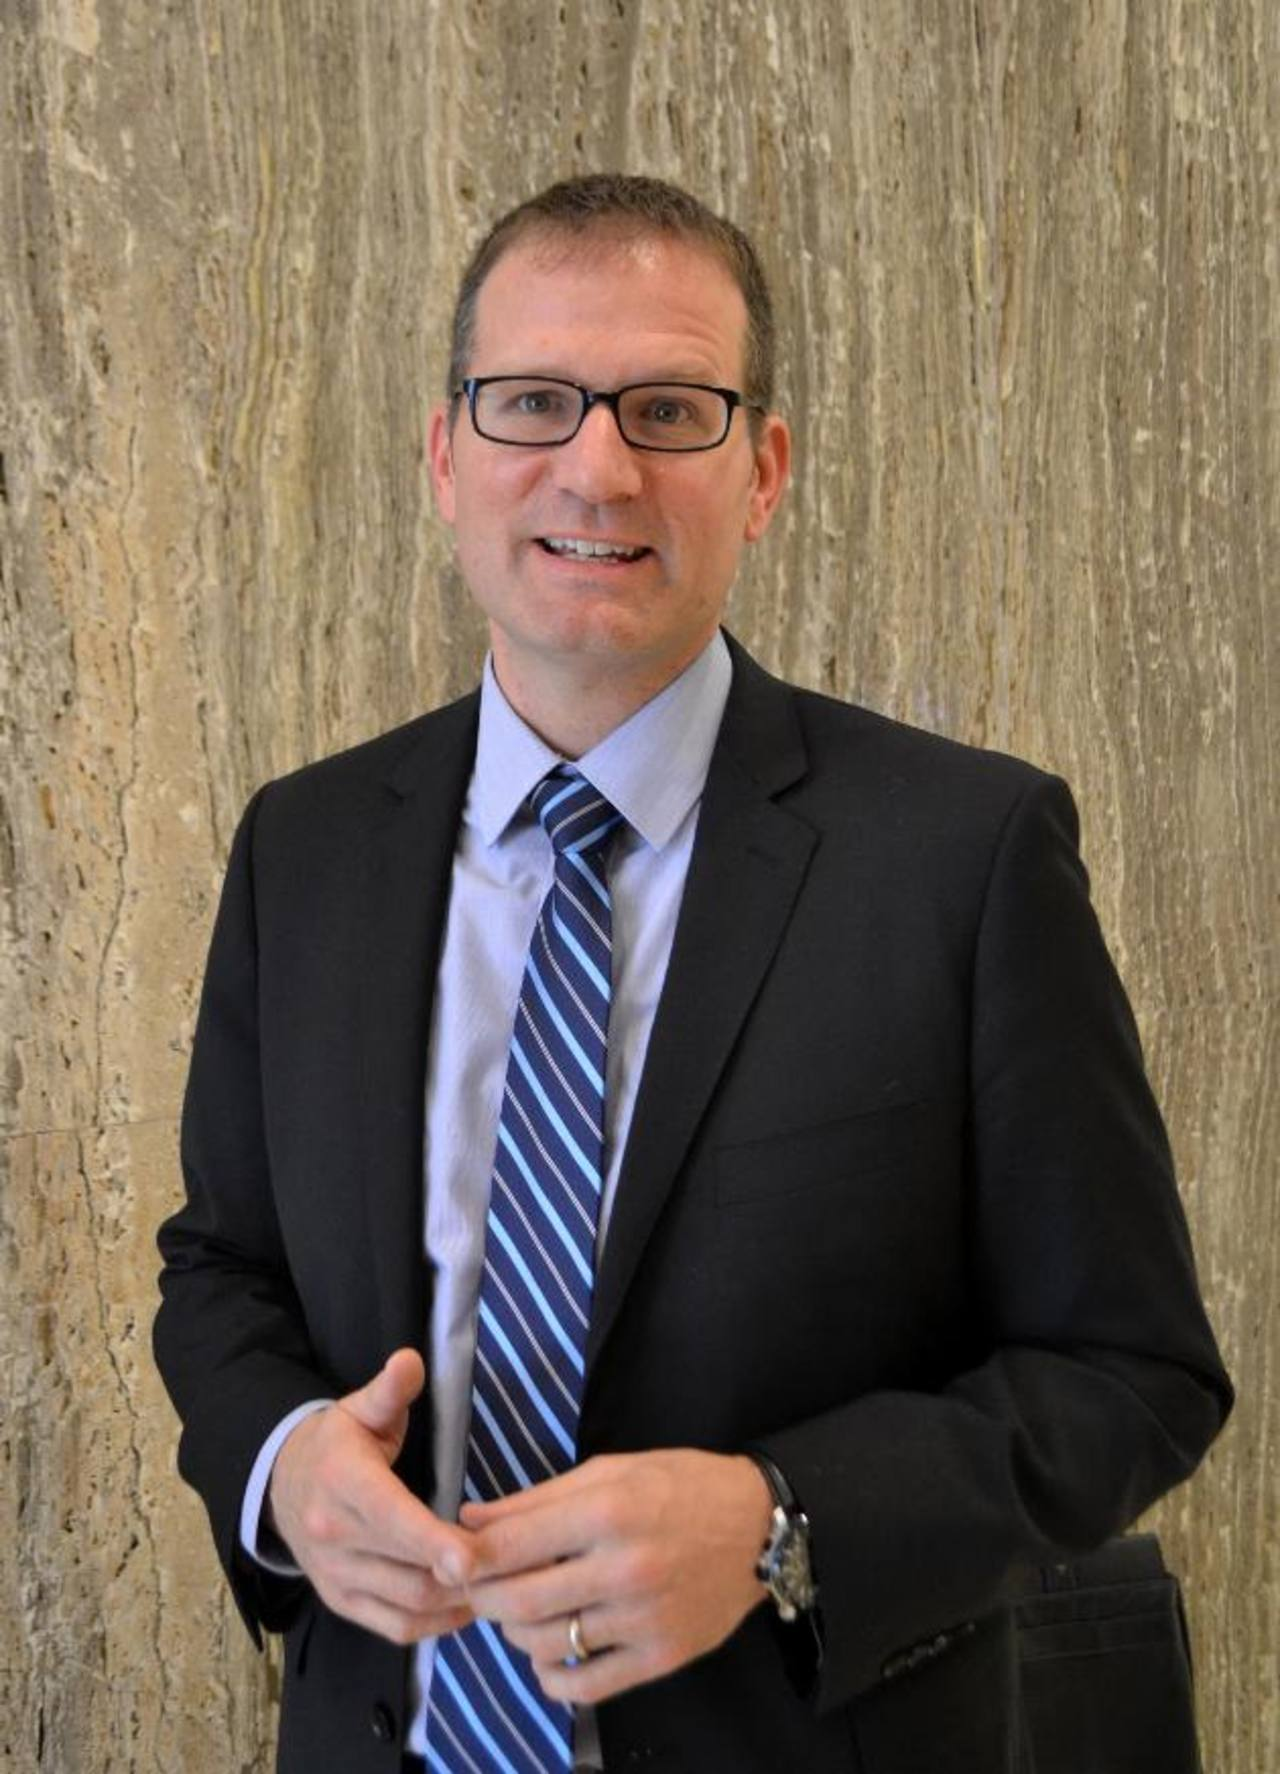 Analista Steven Dudley, director del observatorio InSight Crime e investigador de la Universidad Americana.